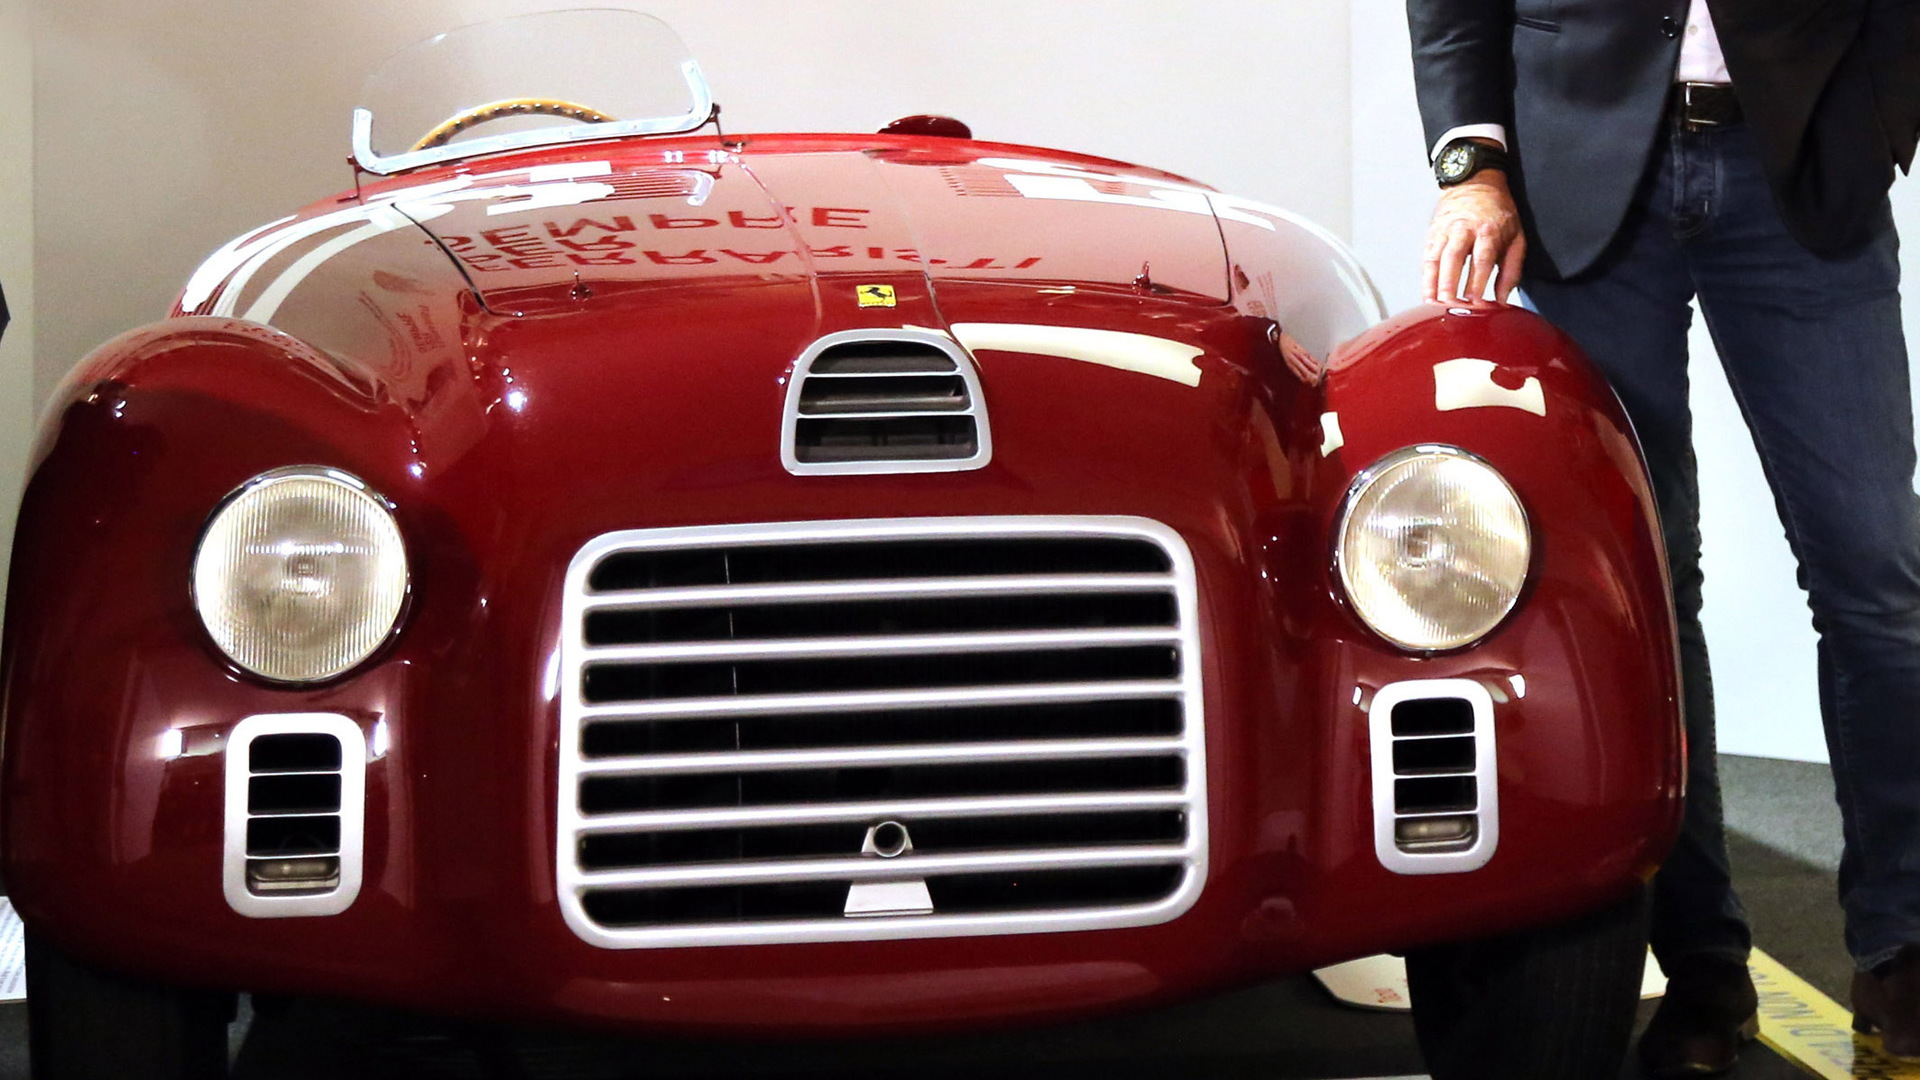 1947 Ferrari 125 S bearing chassis 01C - Ferrari's first car